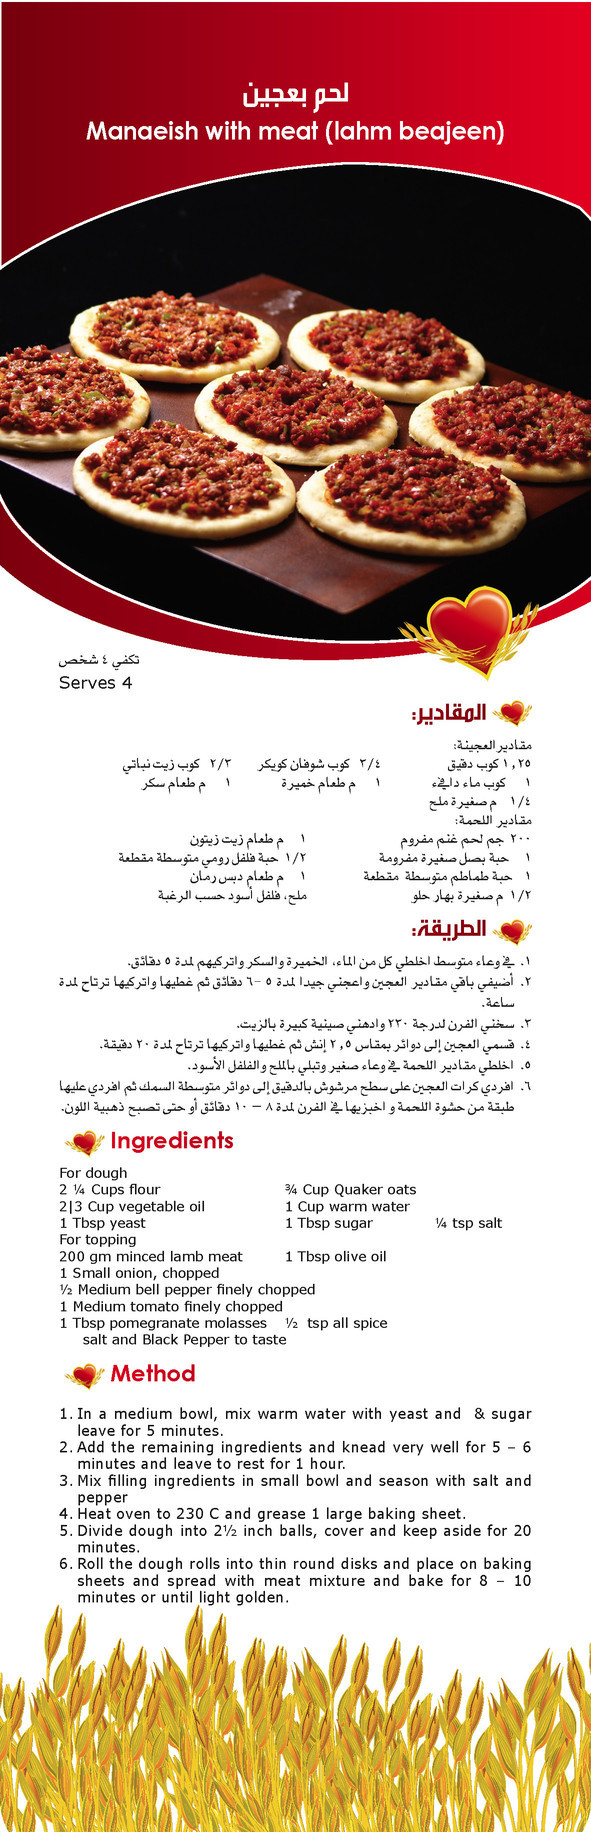 بالفرن 2013 - وصفات رمضانيه اعداد فطائر الدجاج بالفرن 2013سينابون